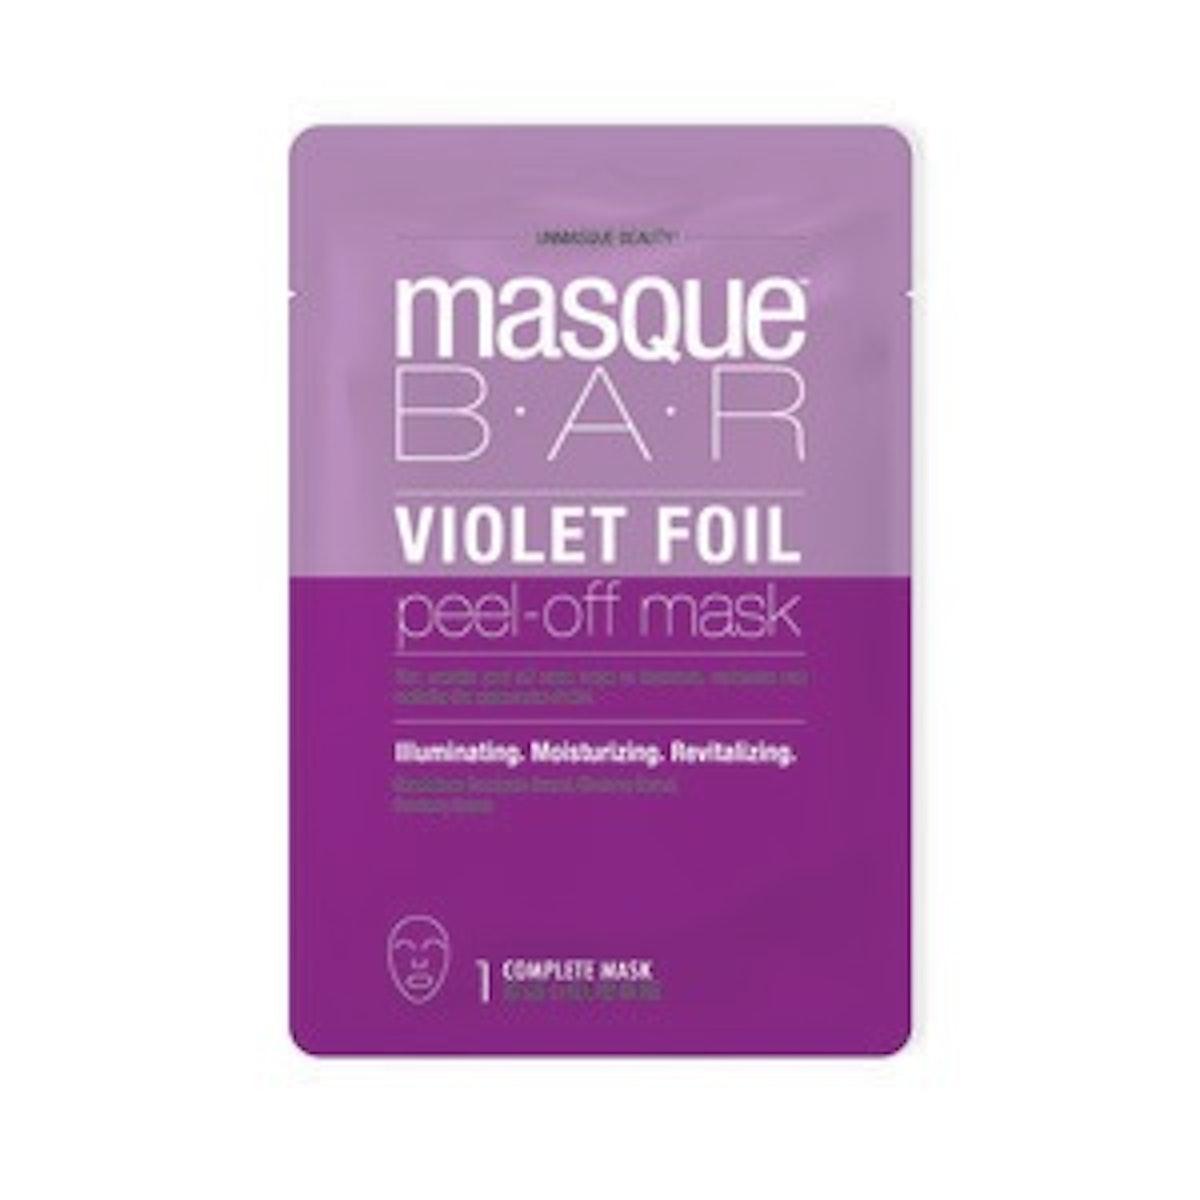 Masque Bar Foil Peel-Off Mask